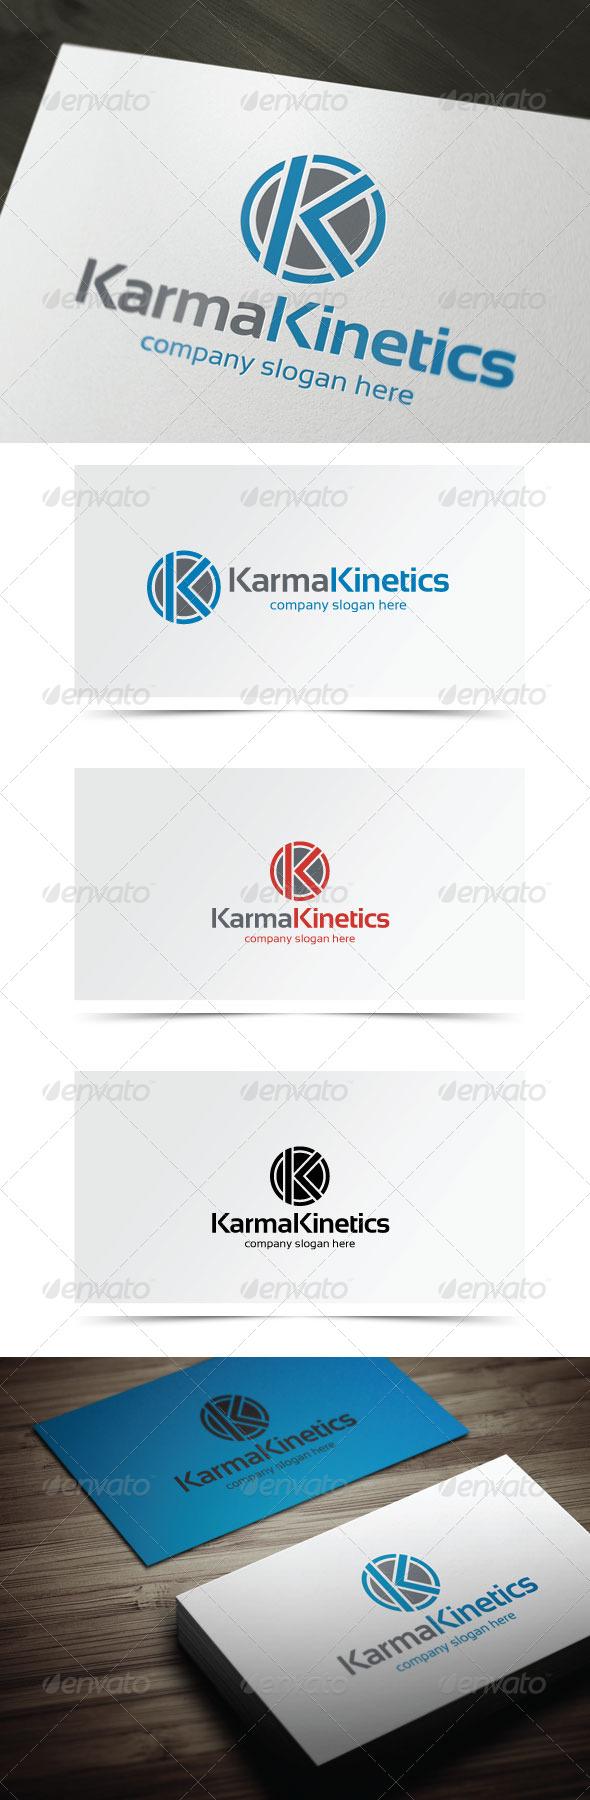 Karma Kinetics - Letters Logo Templates